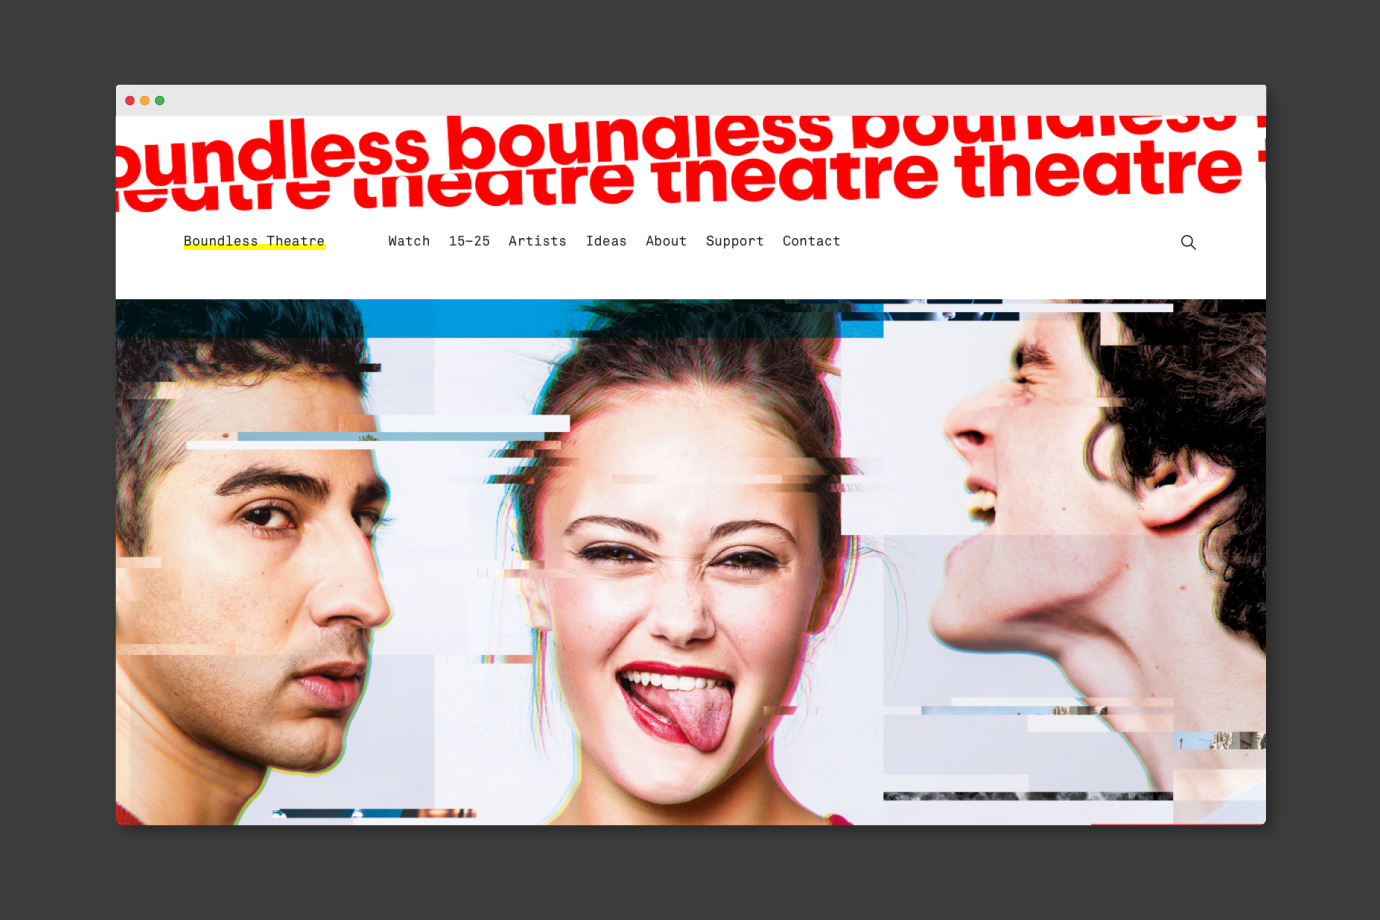 https://spystudio.co.uk/wp-content/uploads/2017/04/Boundless_Theatre_web-1.jpg